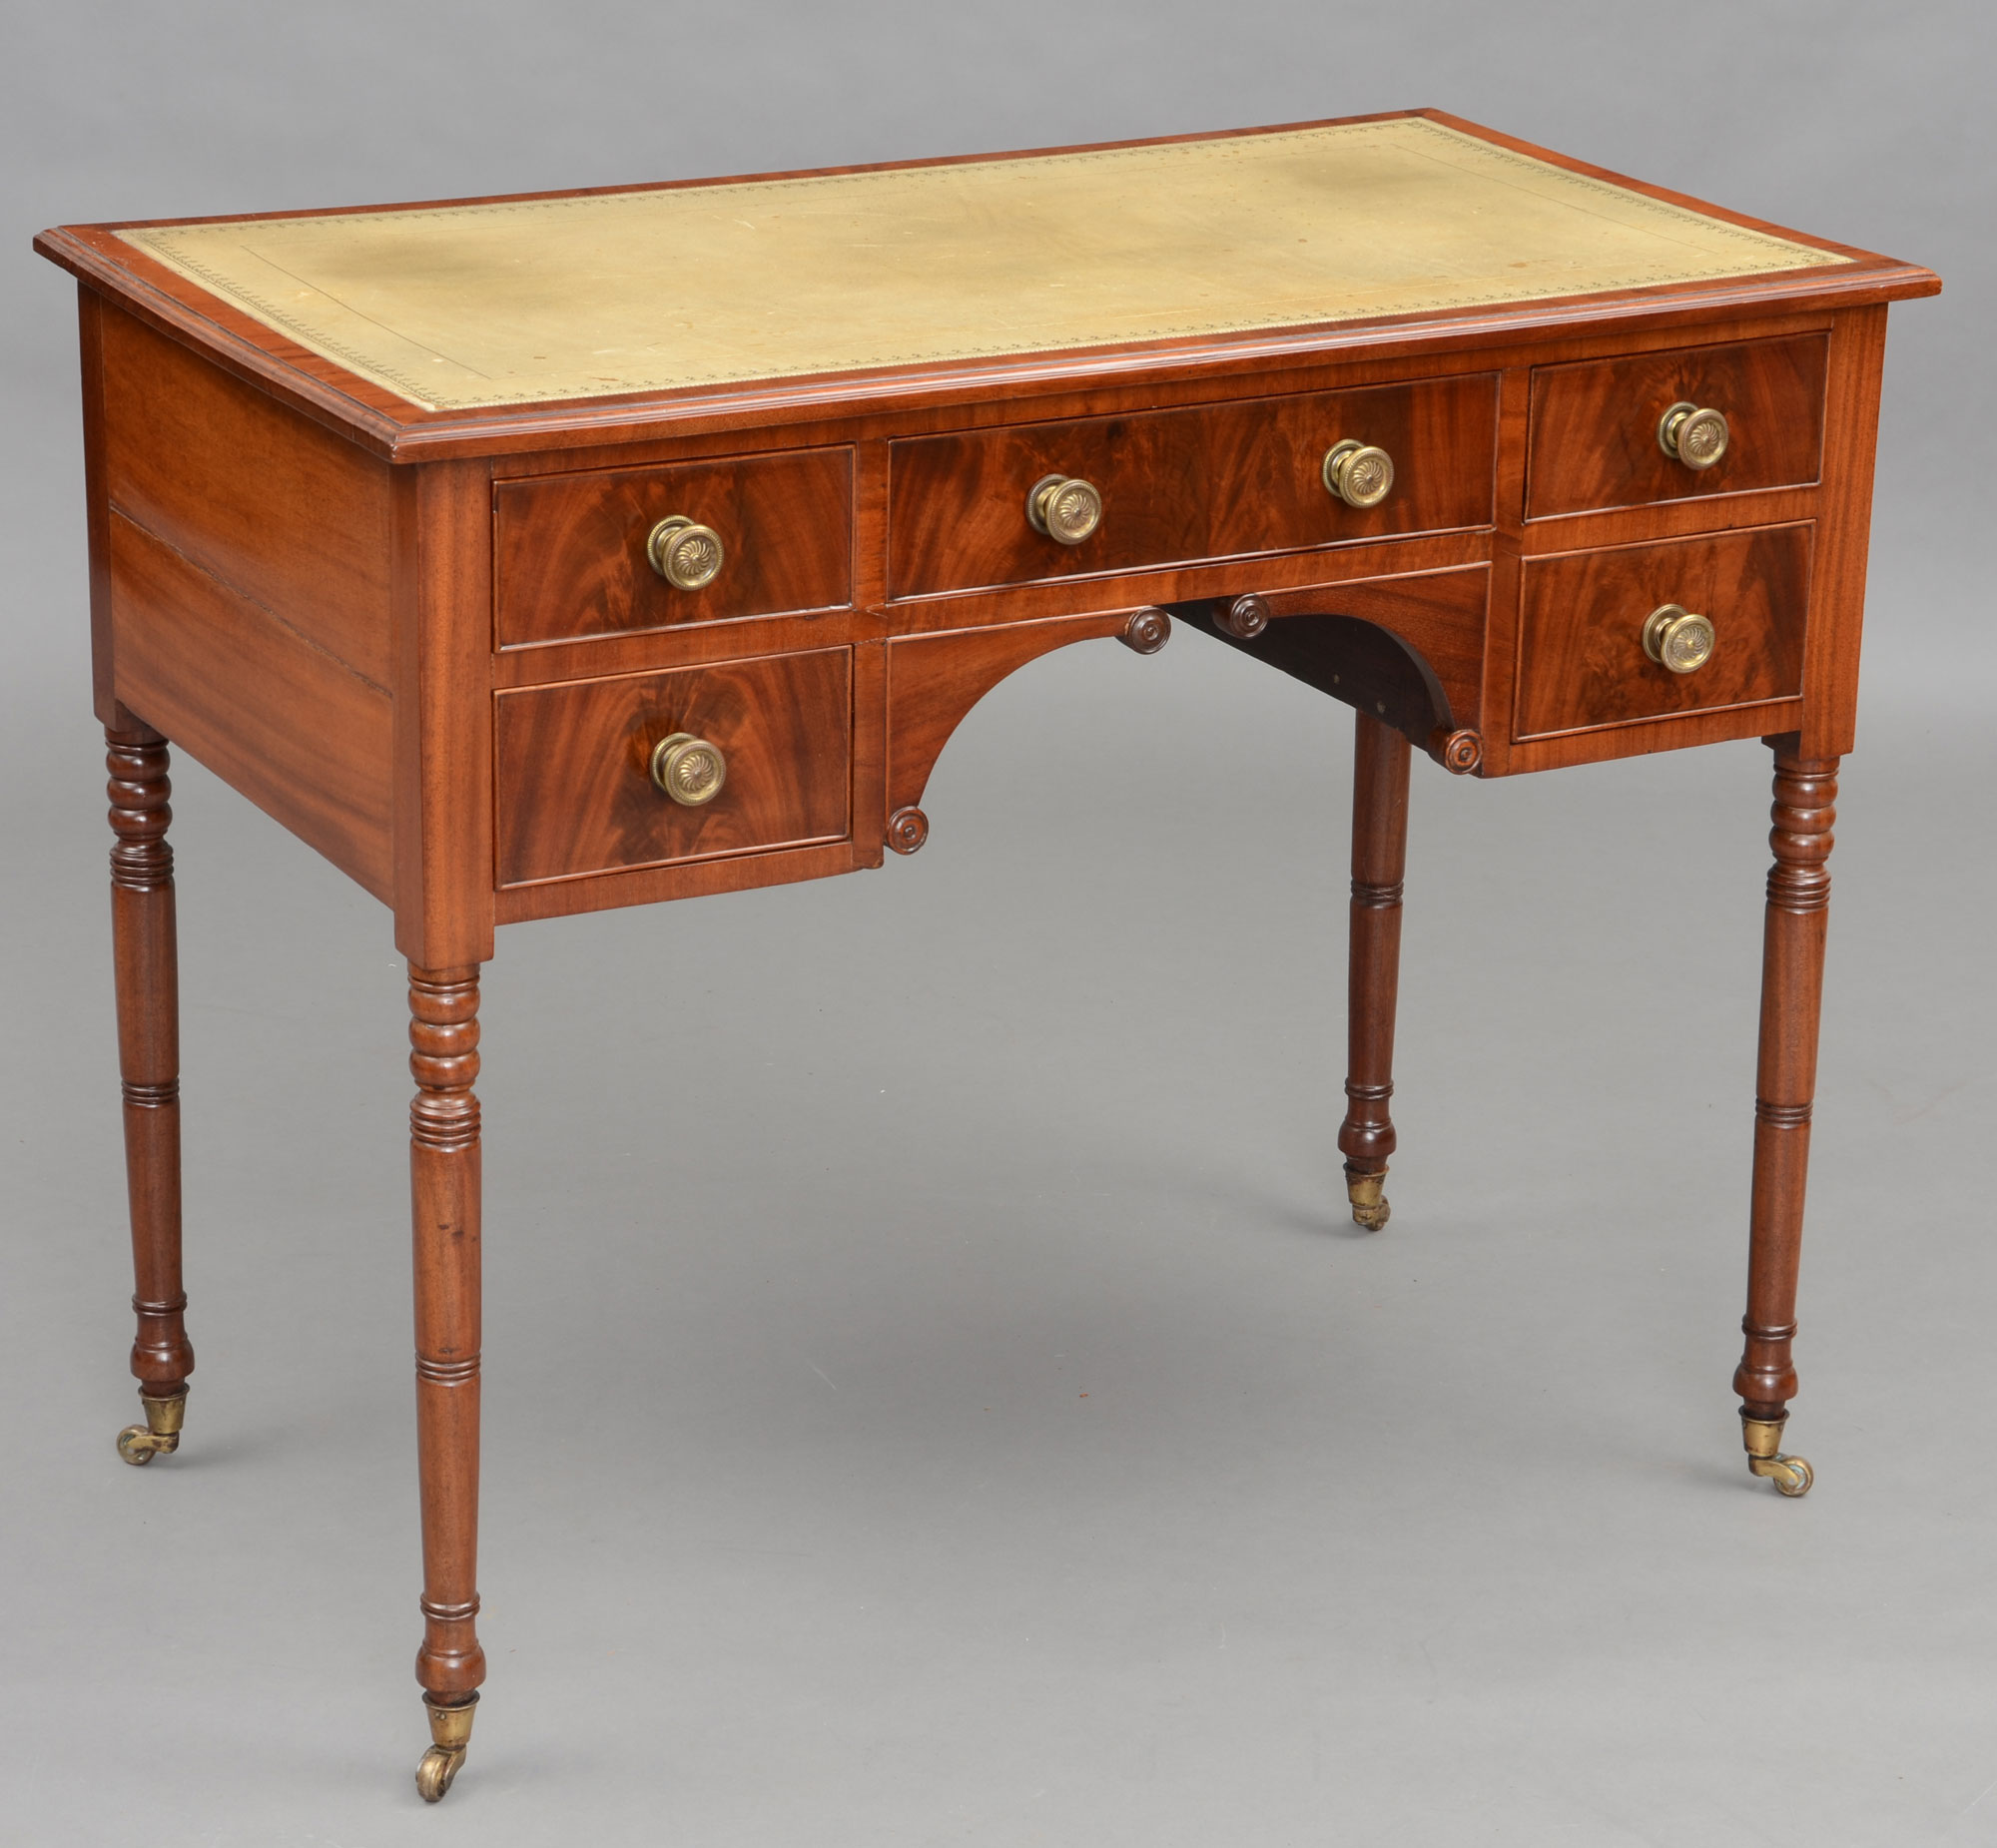 antique ladies writing desk Product » Regency Mahogany Ladies Writing Desk 2 antique ladies writing desk